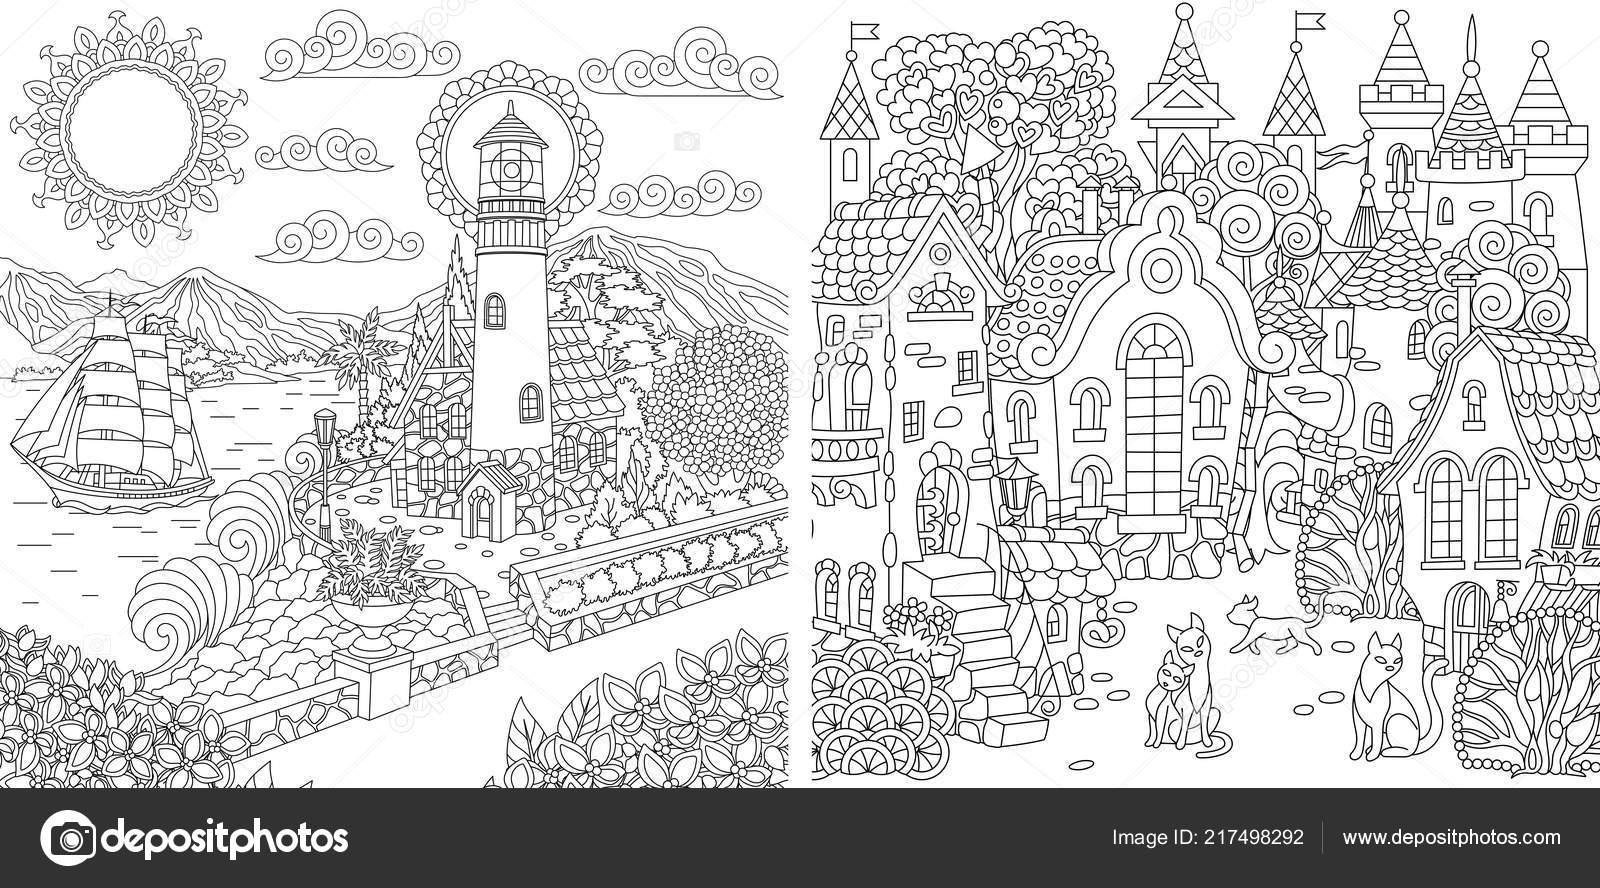 Dibujos Para Colorear Libro Para Colorear Para Adultos Colorear